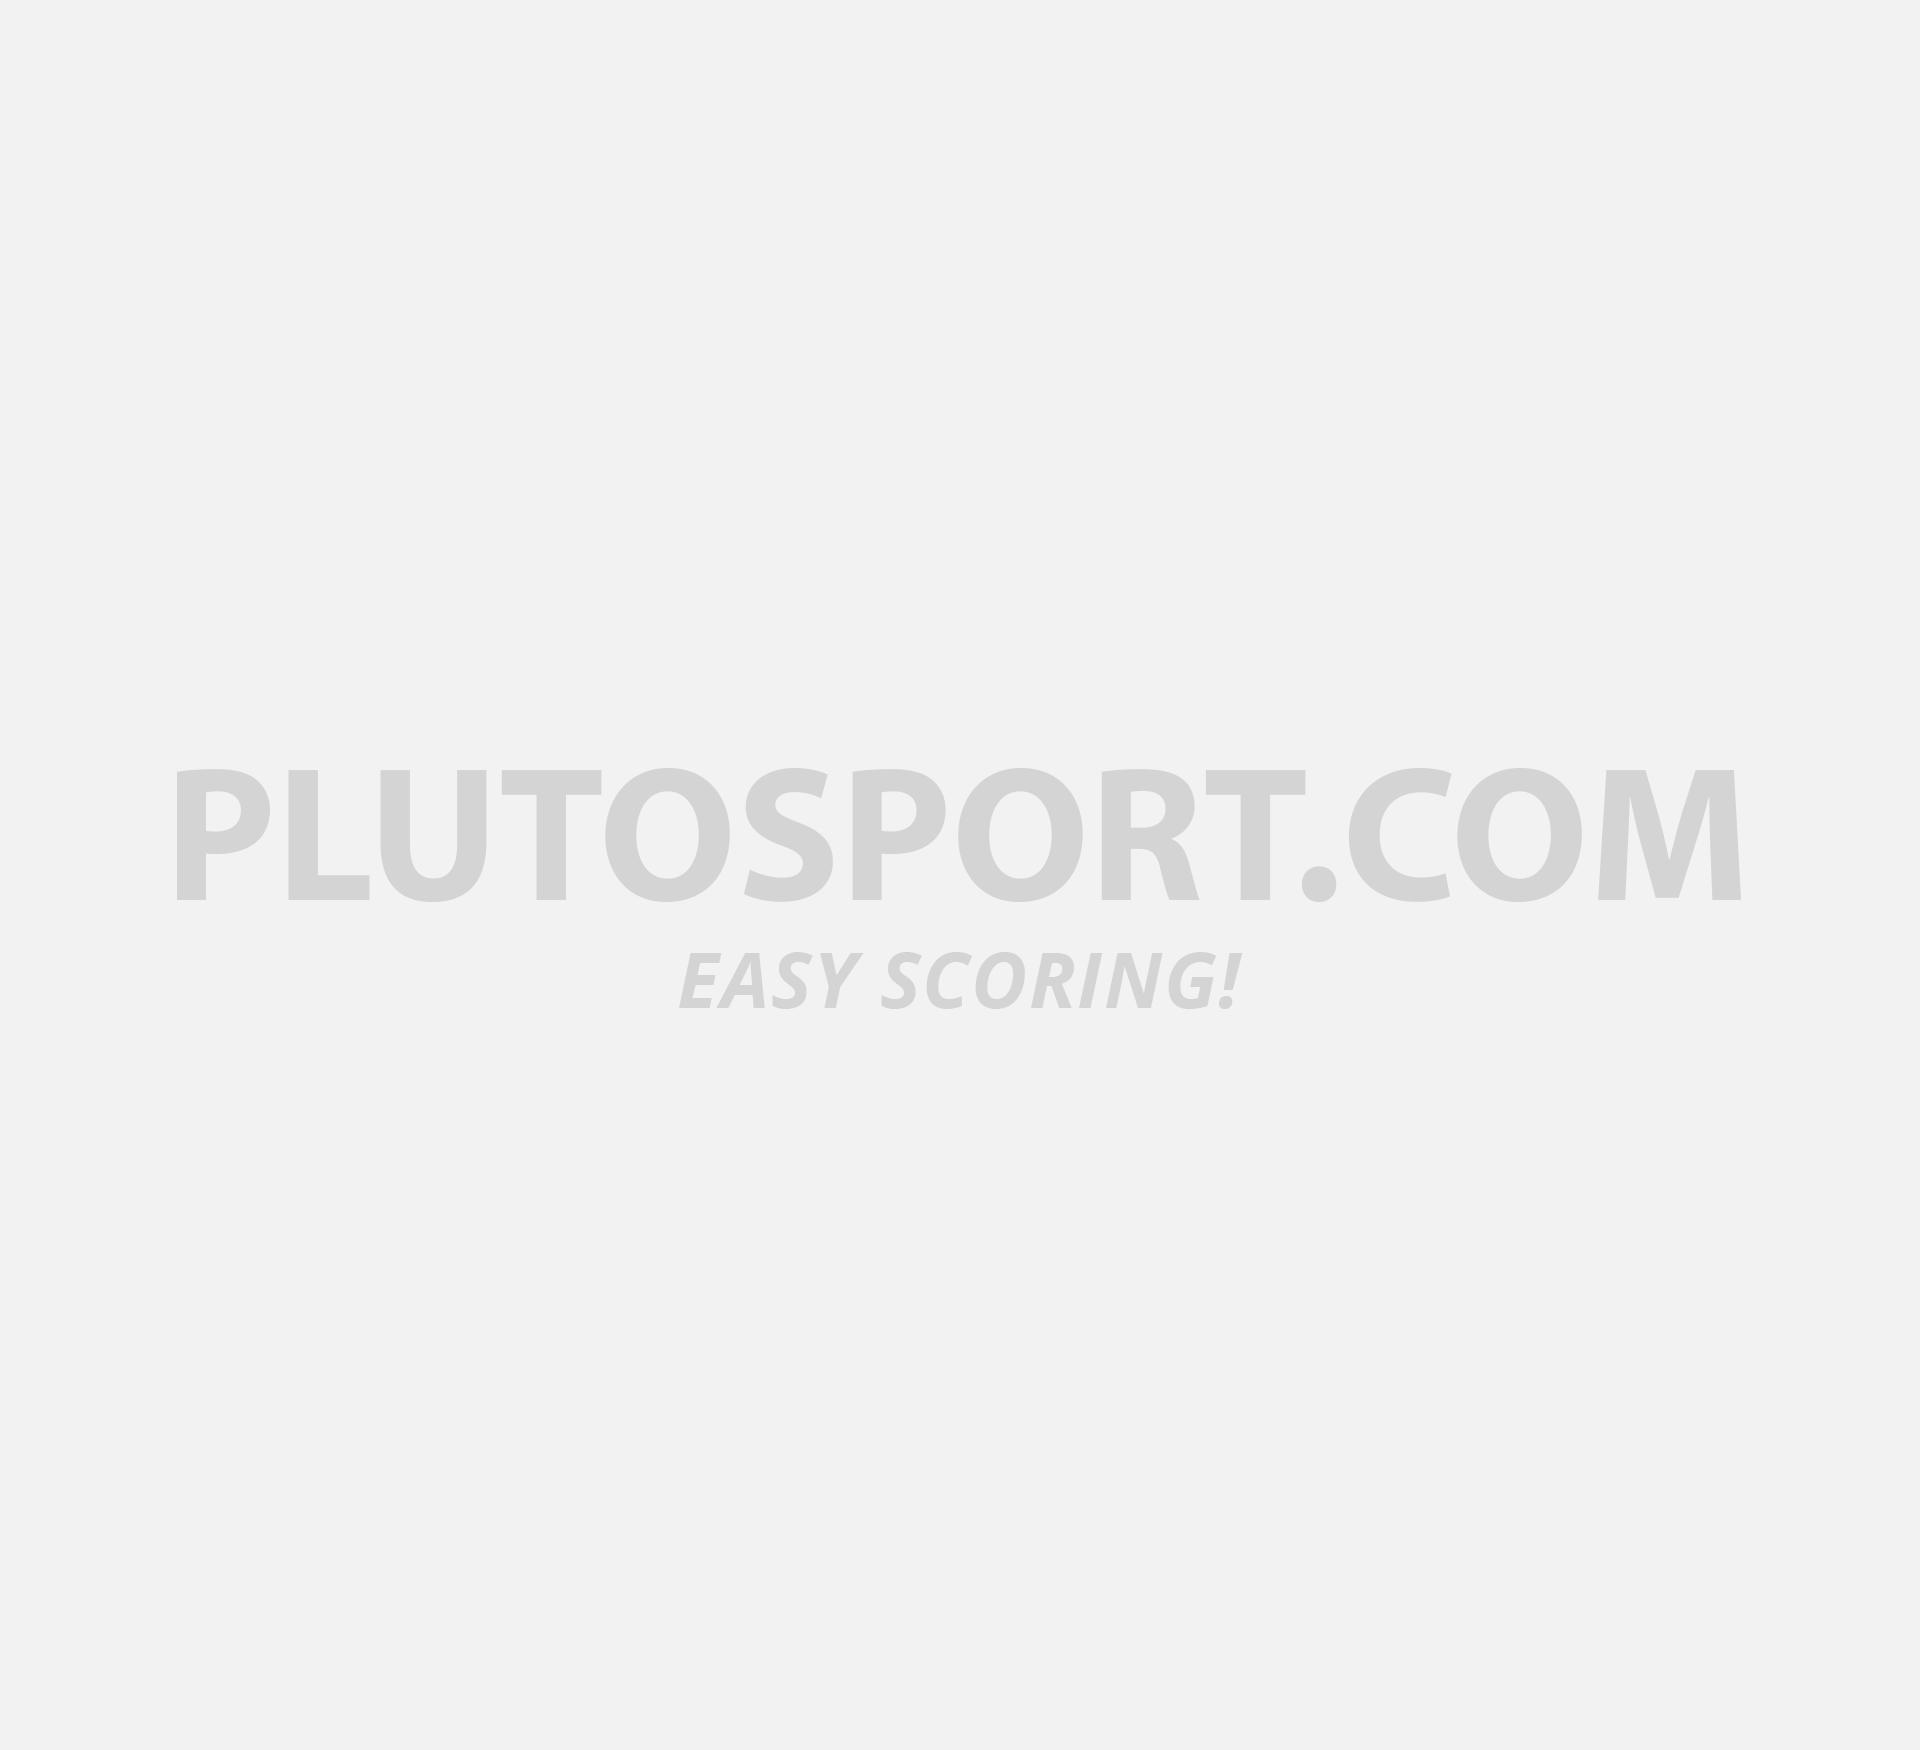 43726990fad Hummel Hannover Goalkeeper Shirt Junior - Shirts - Goalkeepers - Football -  Sports | Plutosport